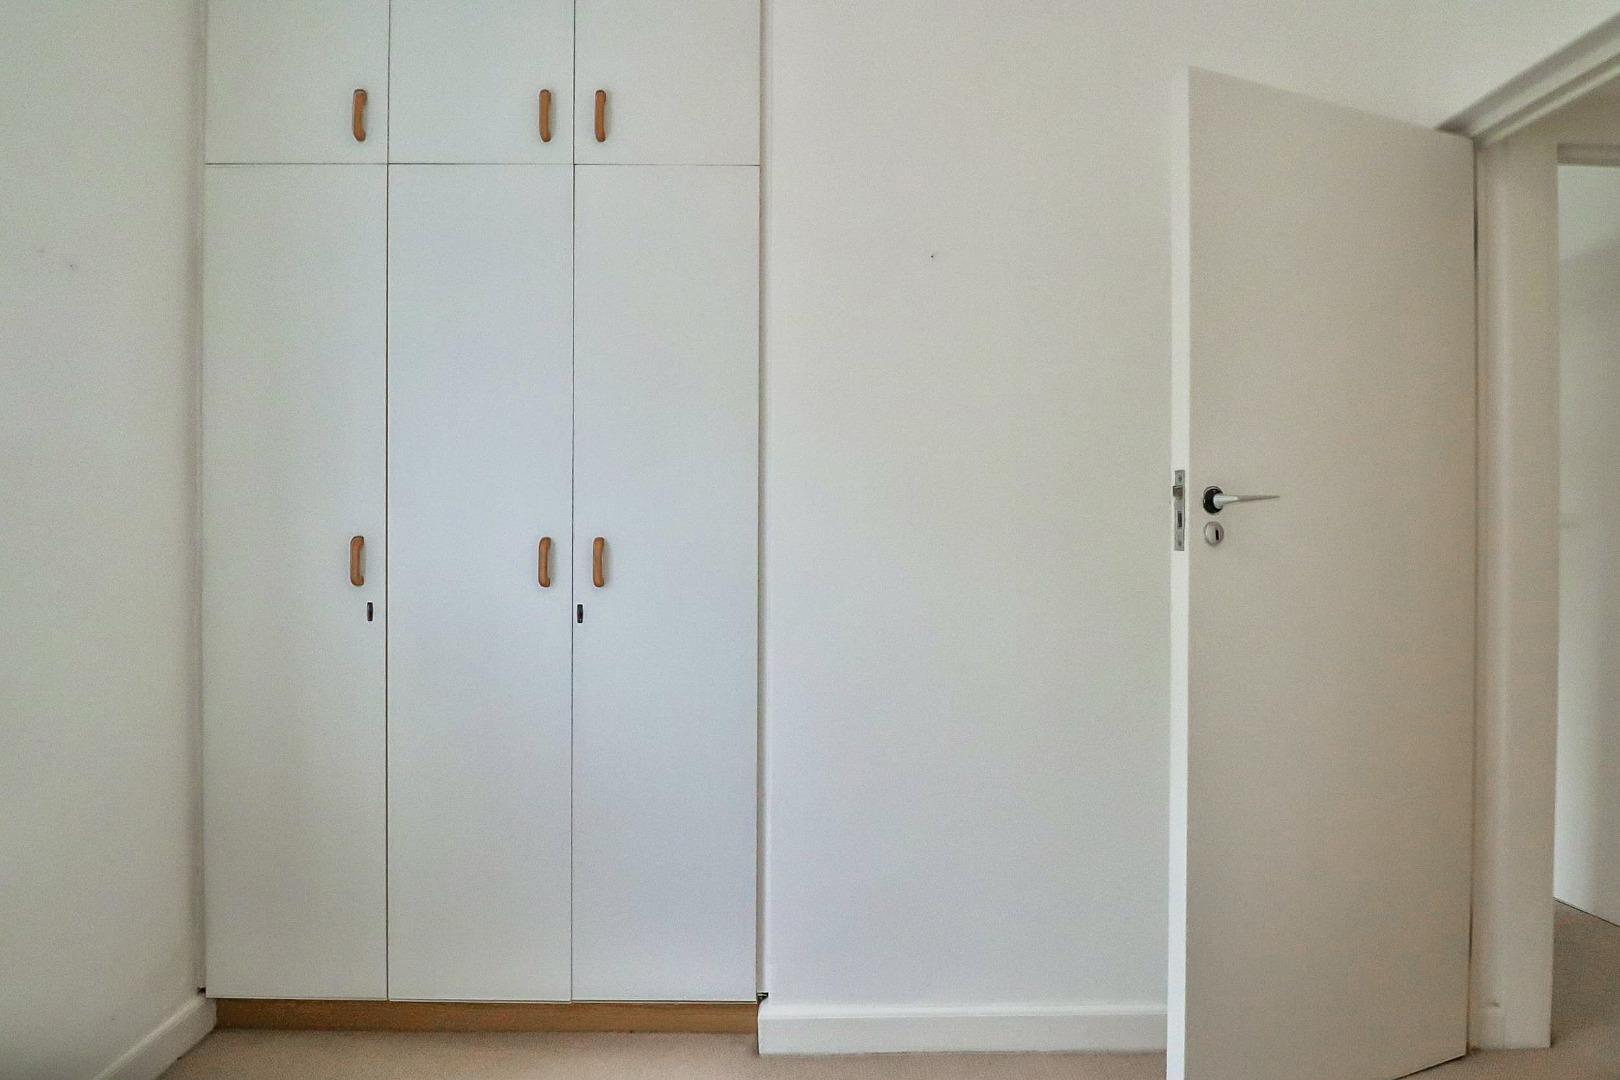 3 Bedroom House For Sale in Belvidere Estate